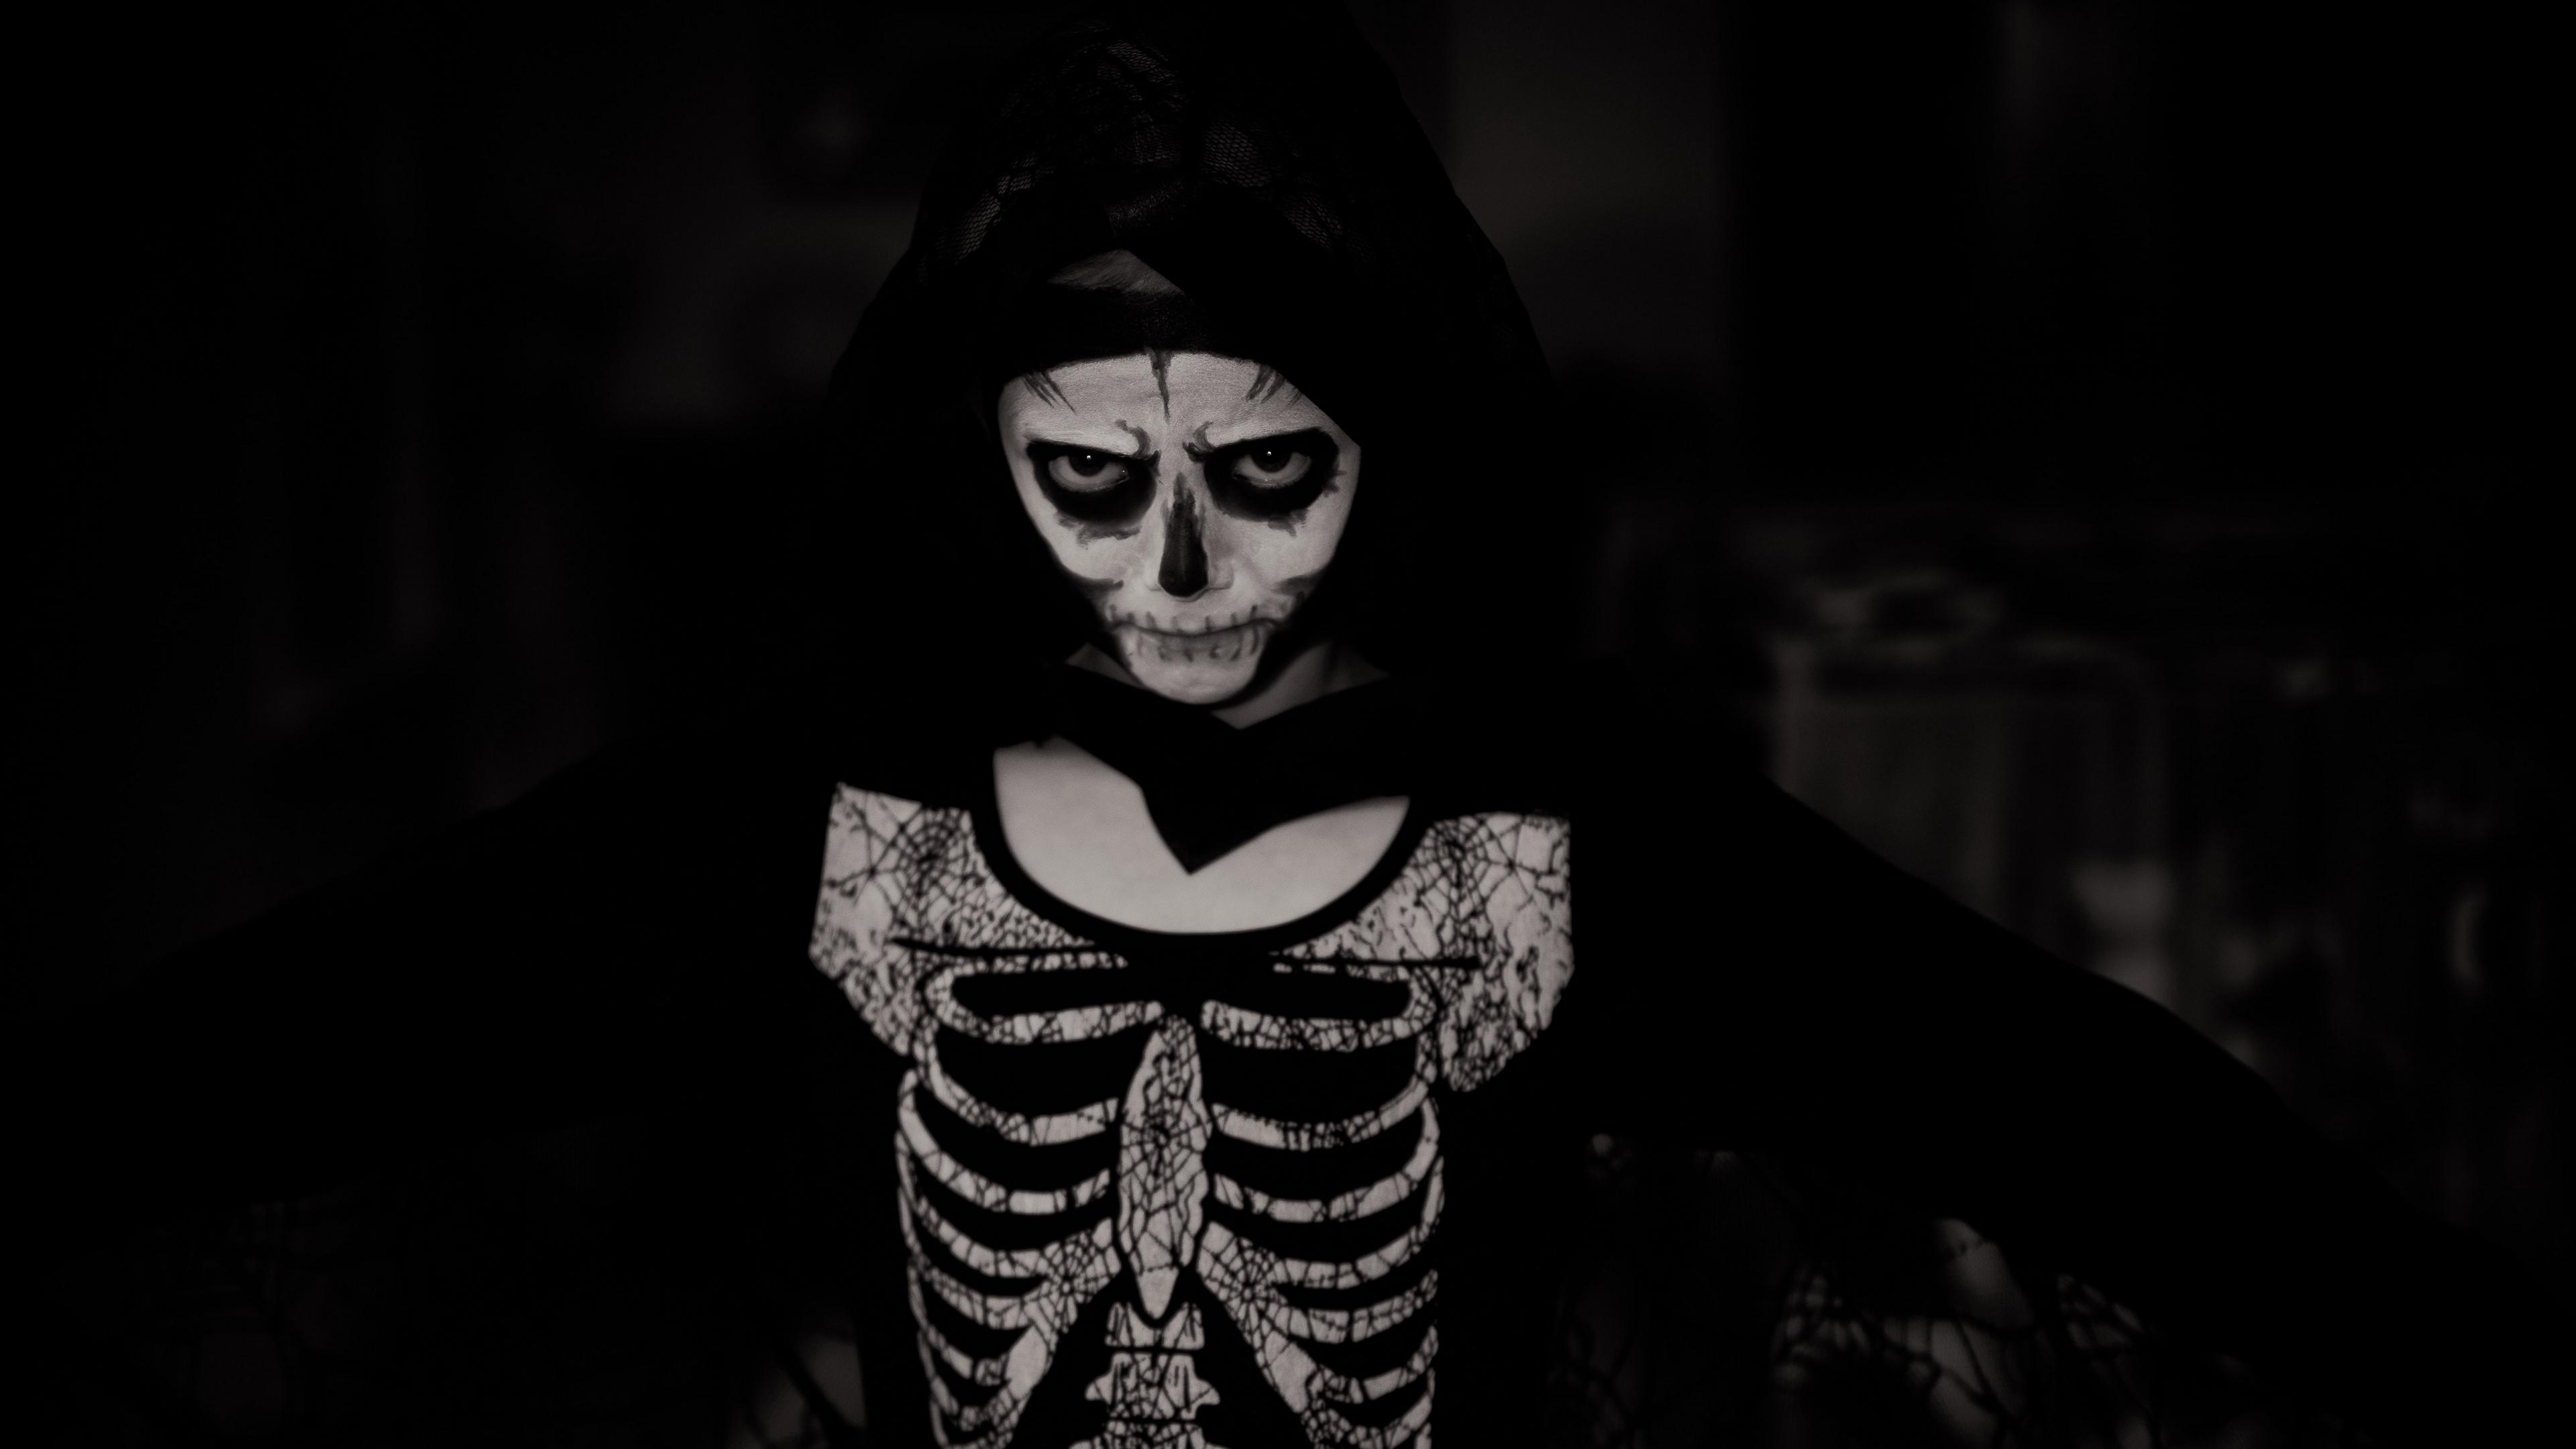 halloween costume skeleton bw 4k 1538344866 - halloween, costume, skeleton, bw 4k - skeleton, halloween, costume